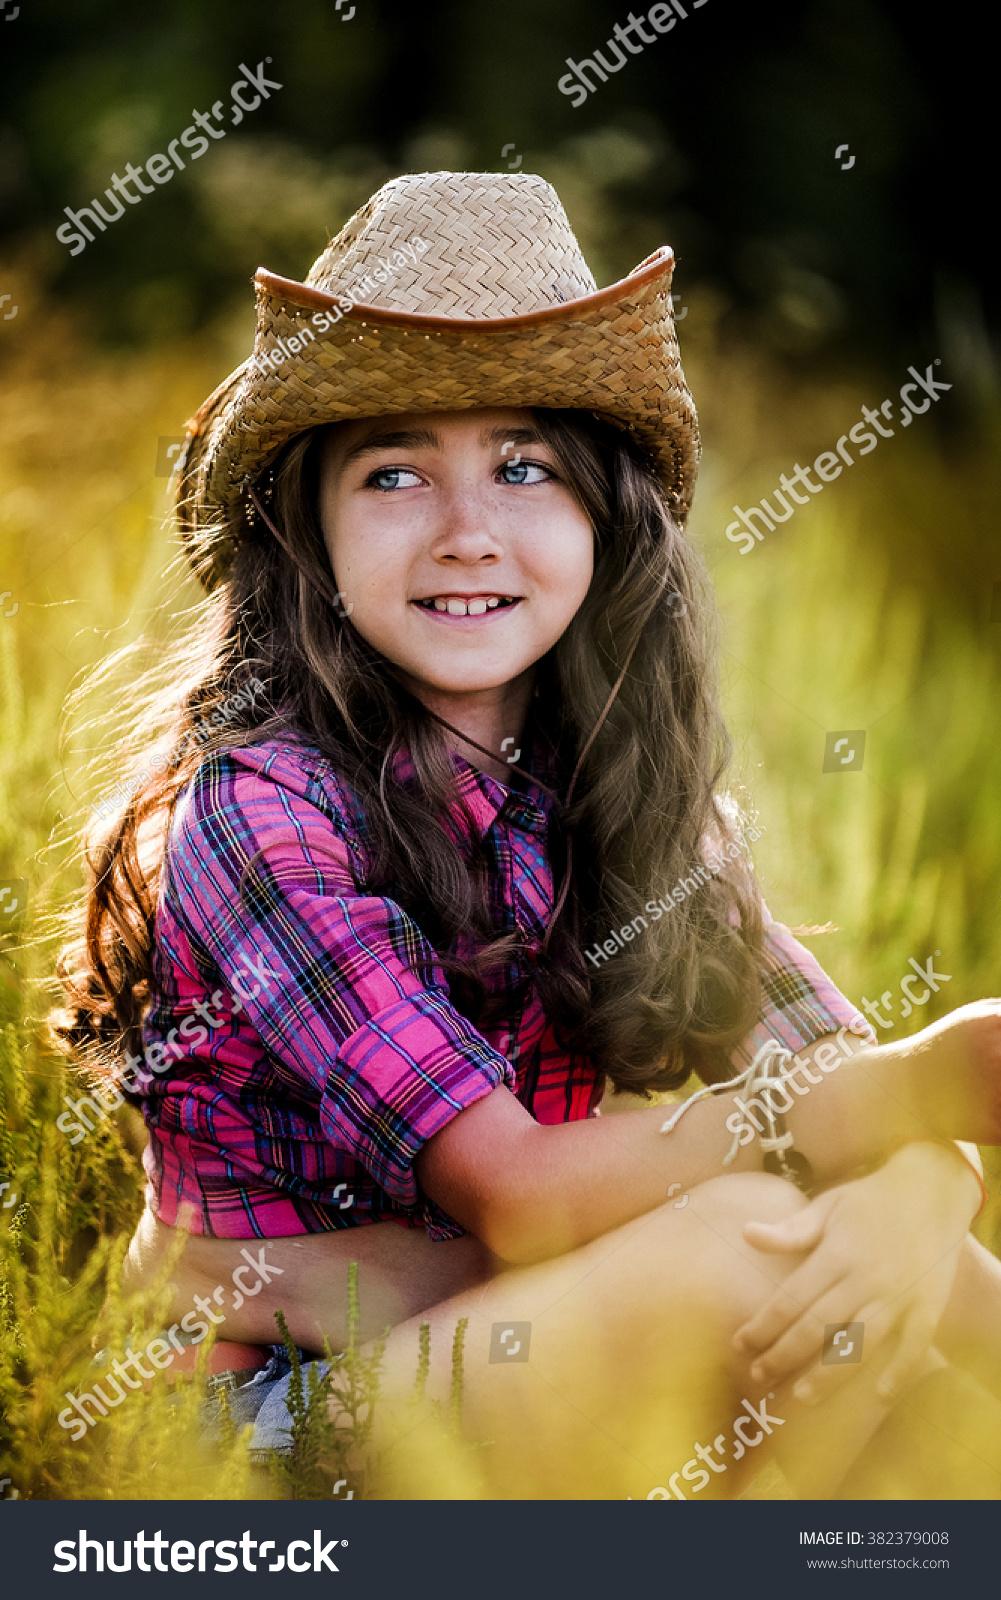 dc5c70345005d Cute Child Having Fun Outdoors Little Stock Photo (Edit Now ...